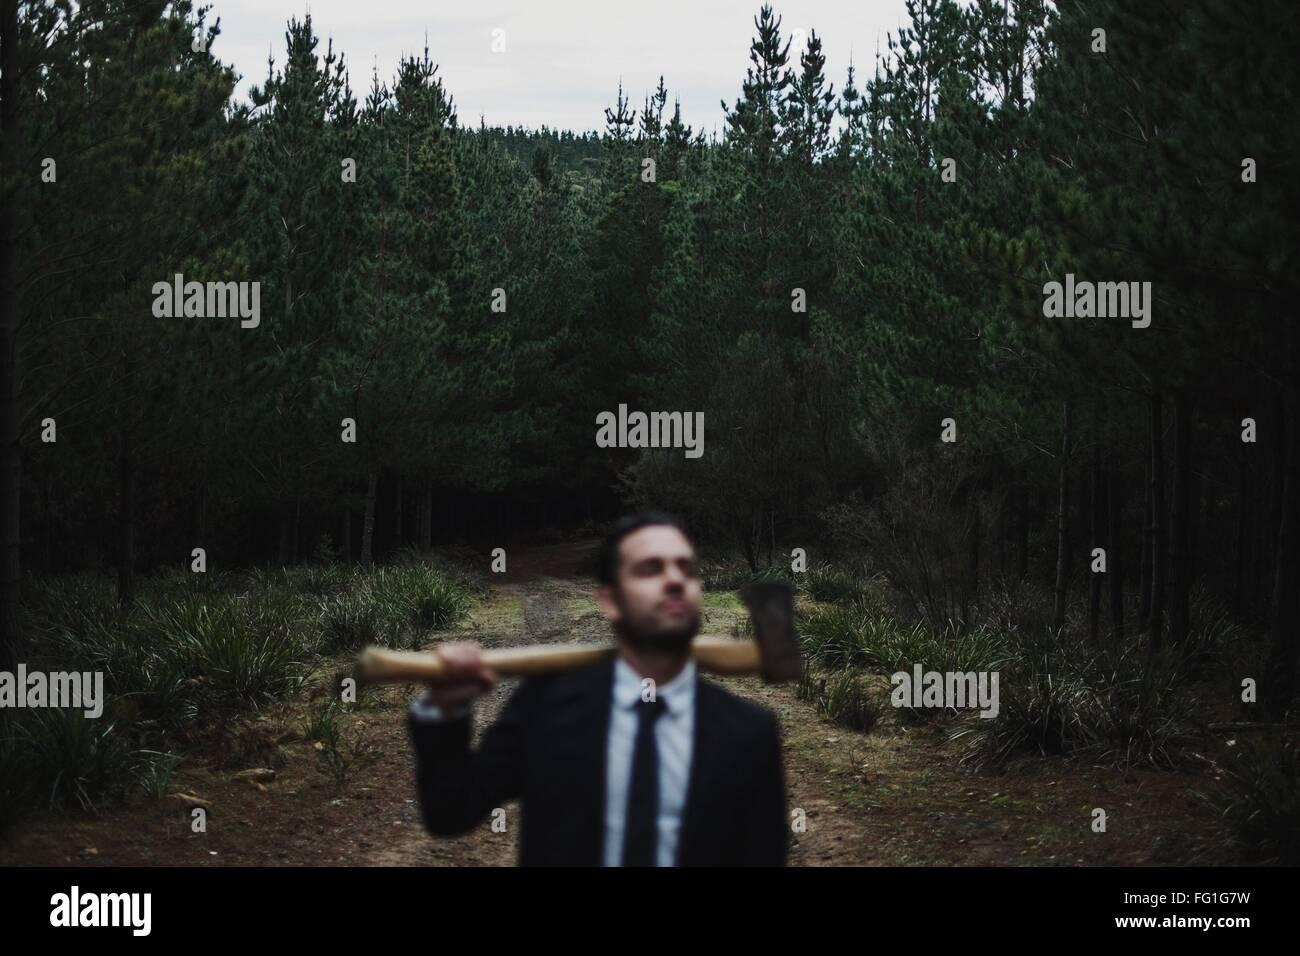 Mann im Anzug mit Axt im Wald Stockbild